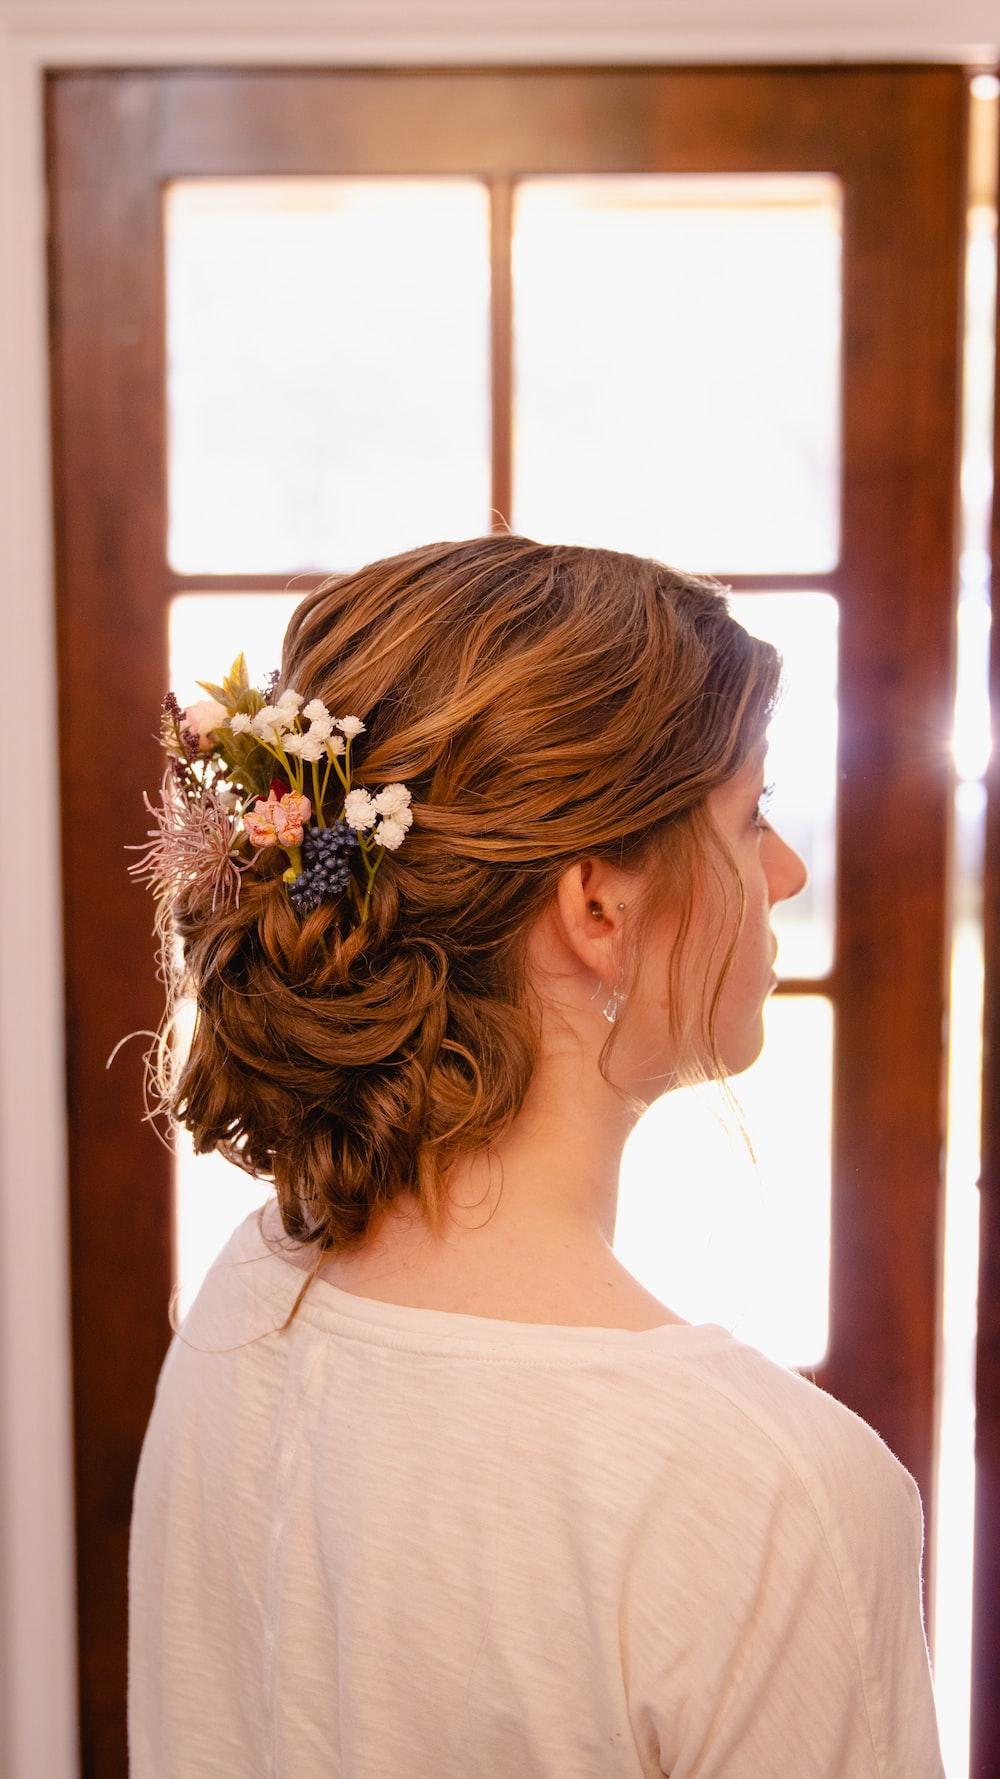 woman in white floral dress wearing white flower headband